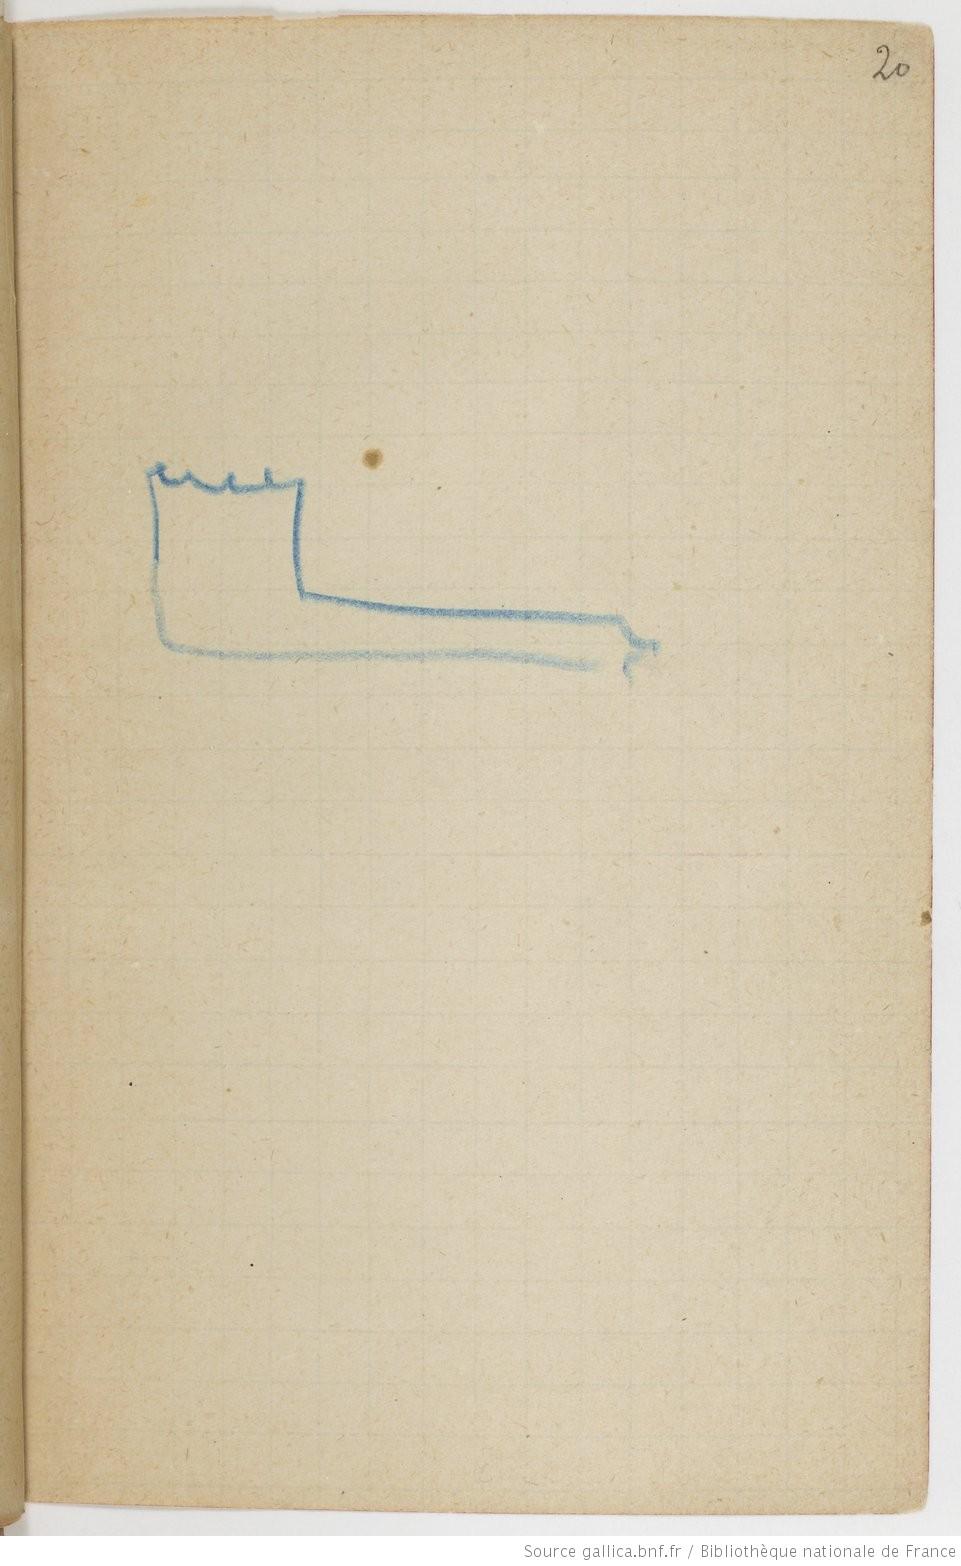 Рис.9 Эдгар Дега, Записная книжка5, стр.20